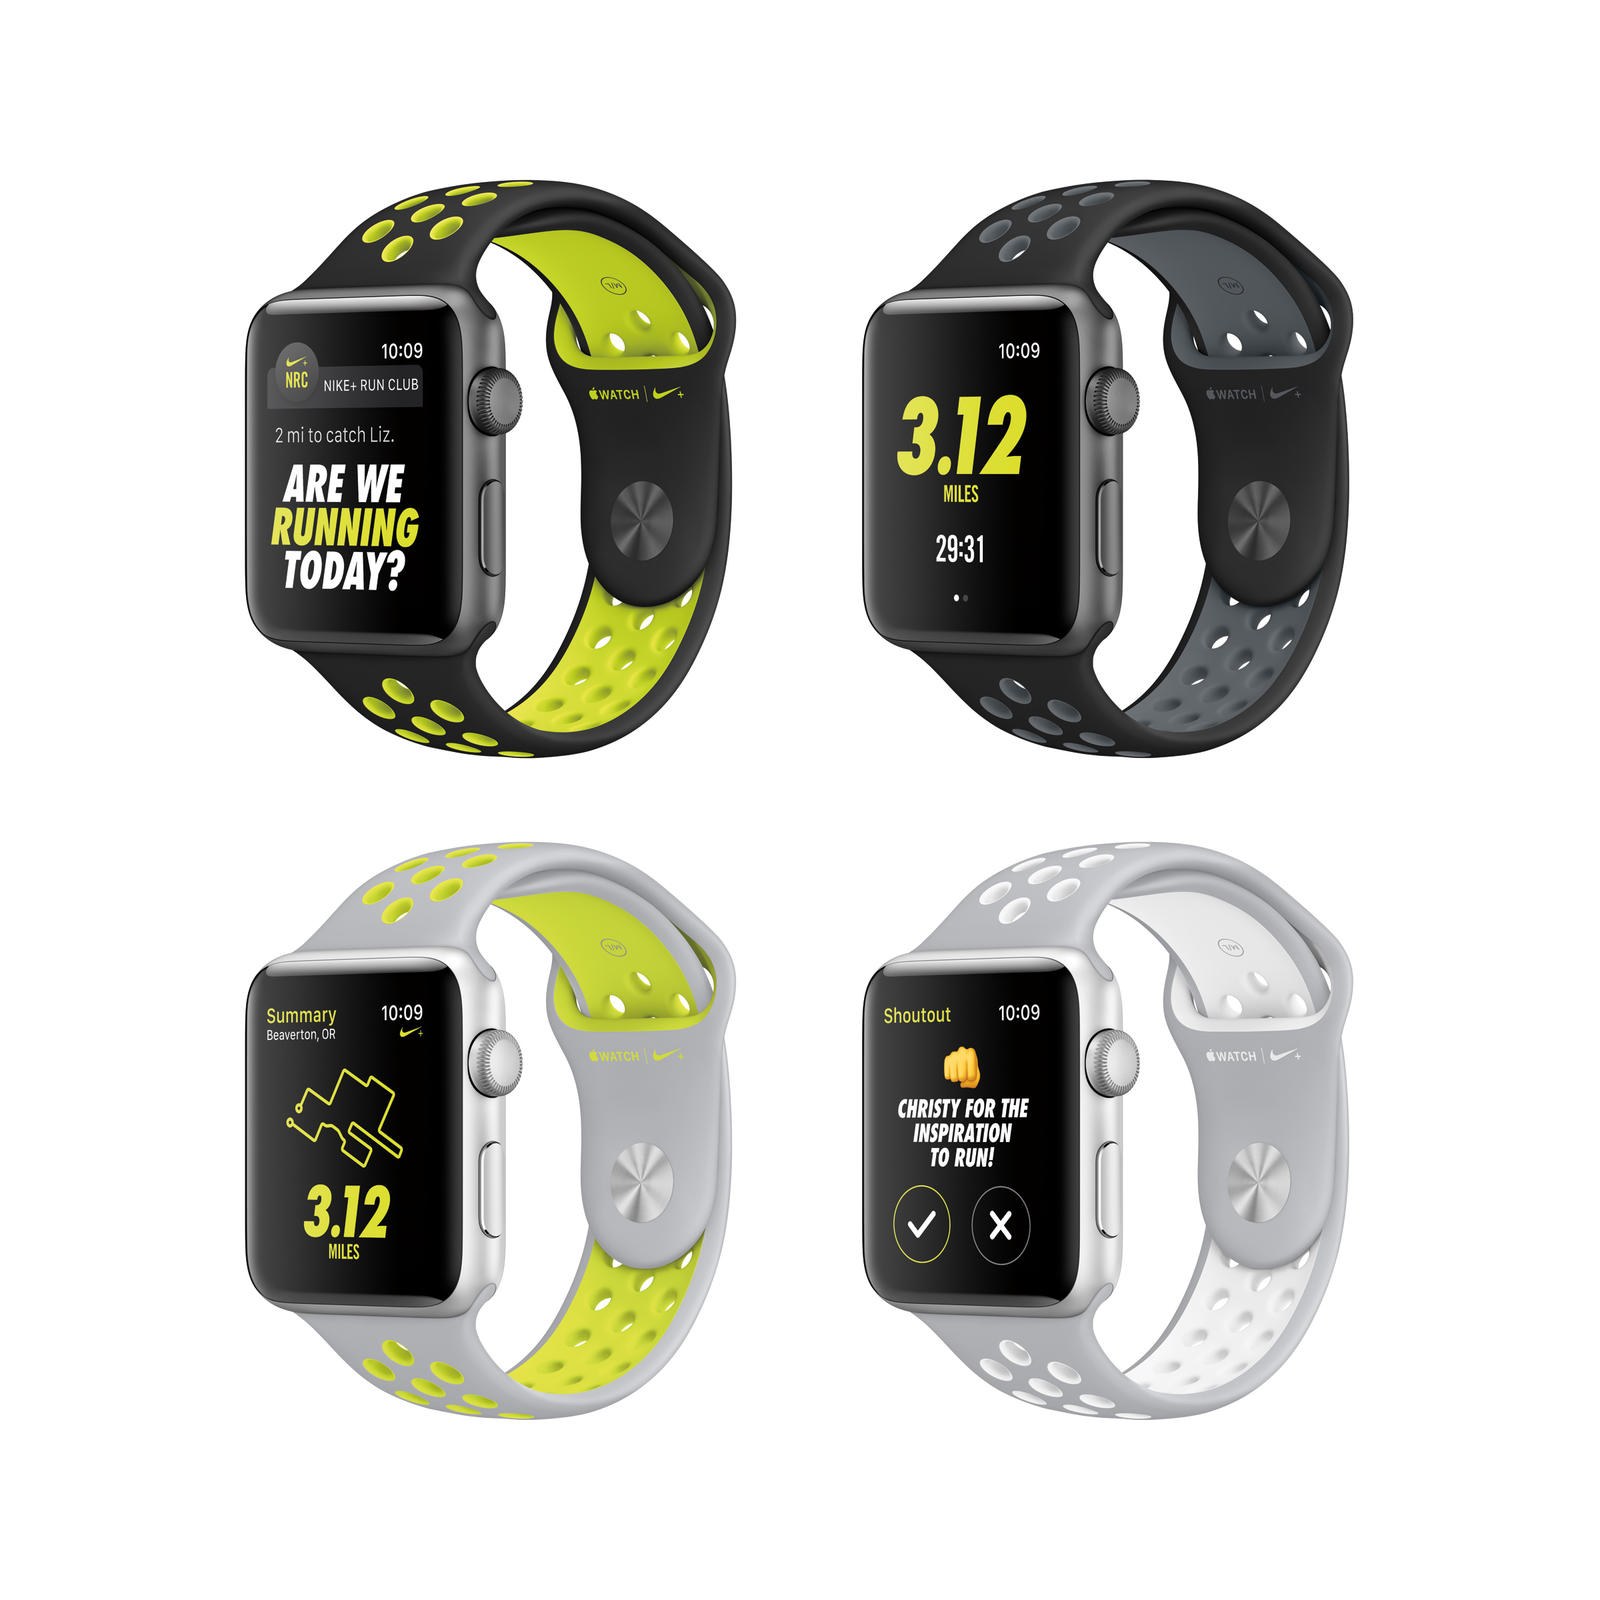 nike-plus-apple-watch-2016-data_native_1600-0